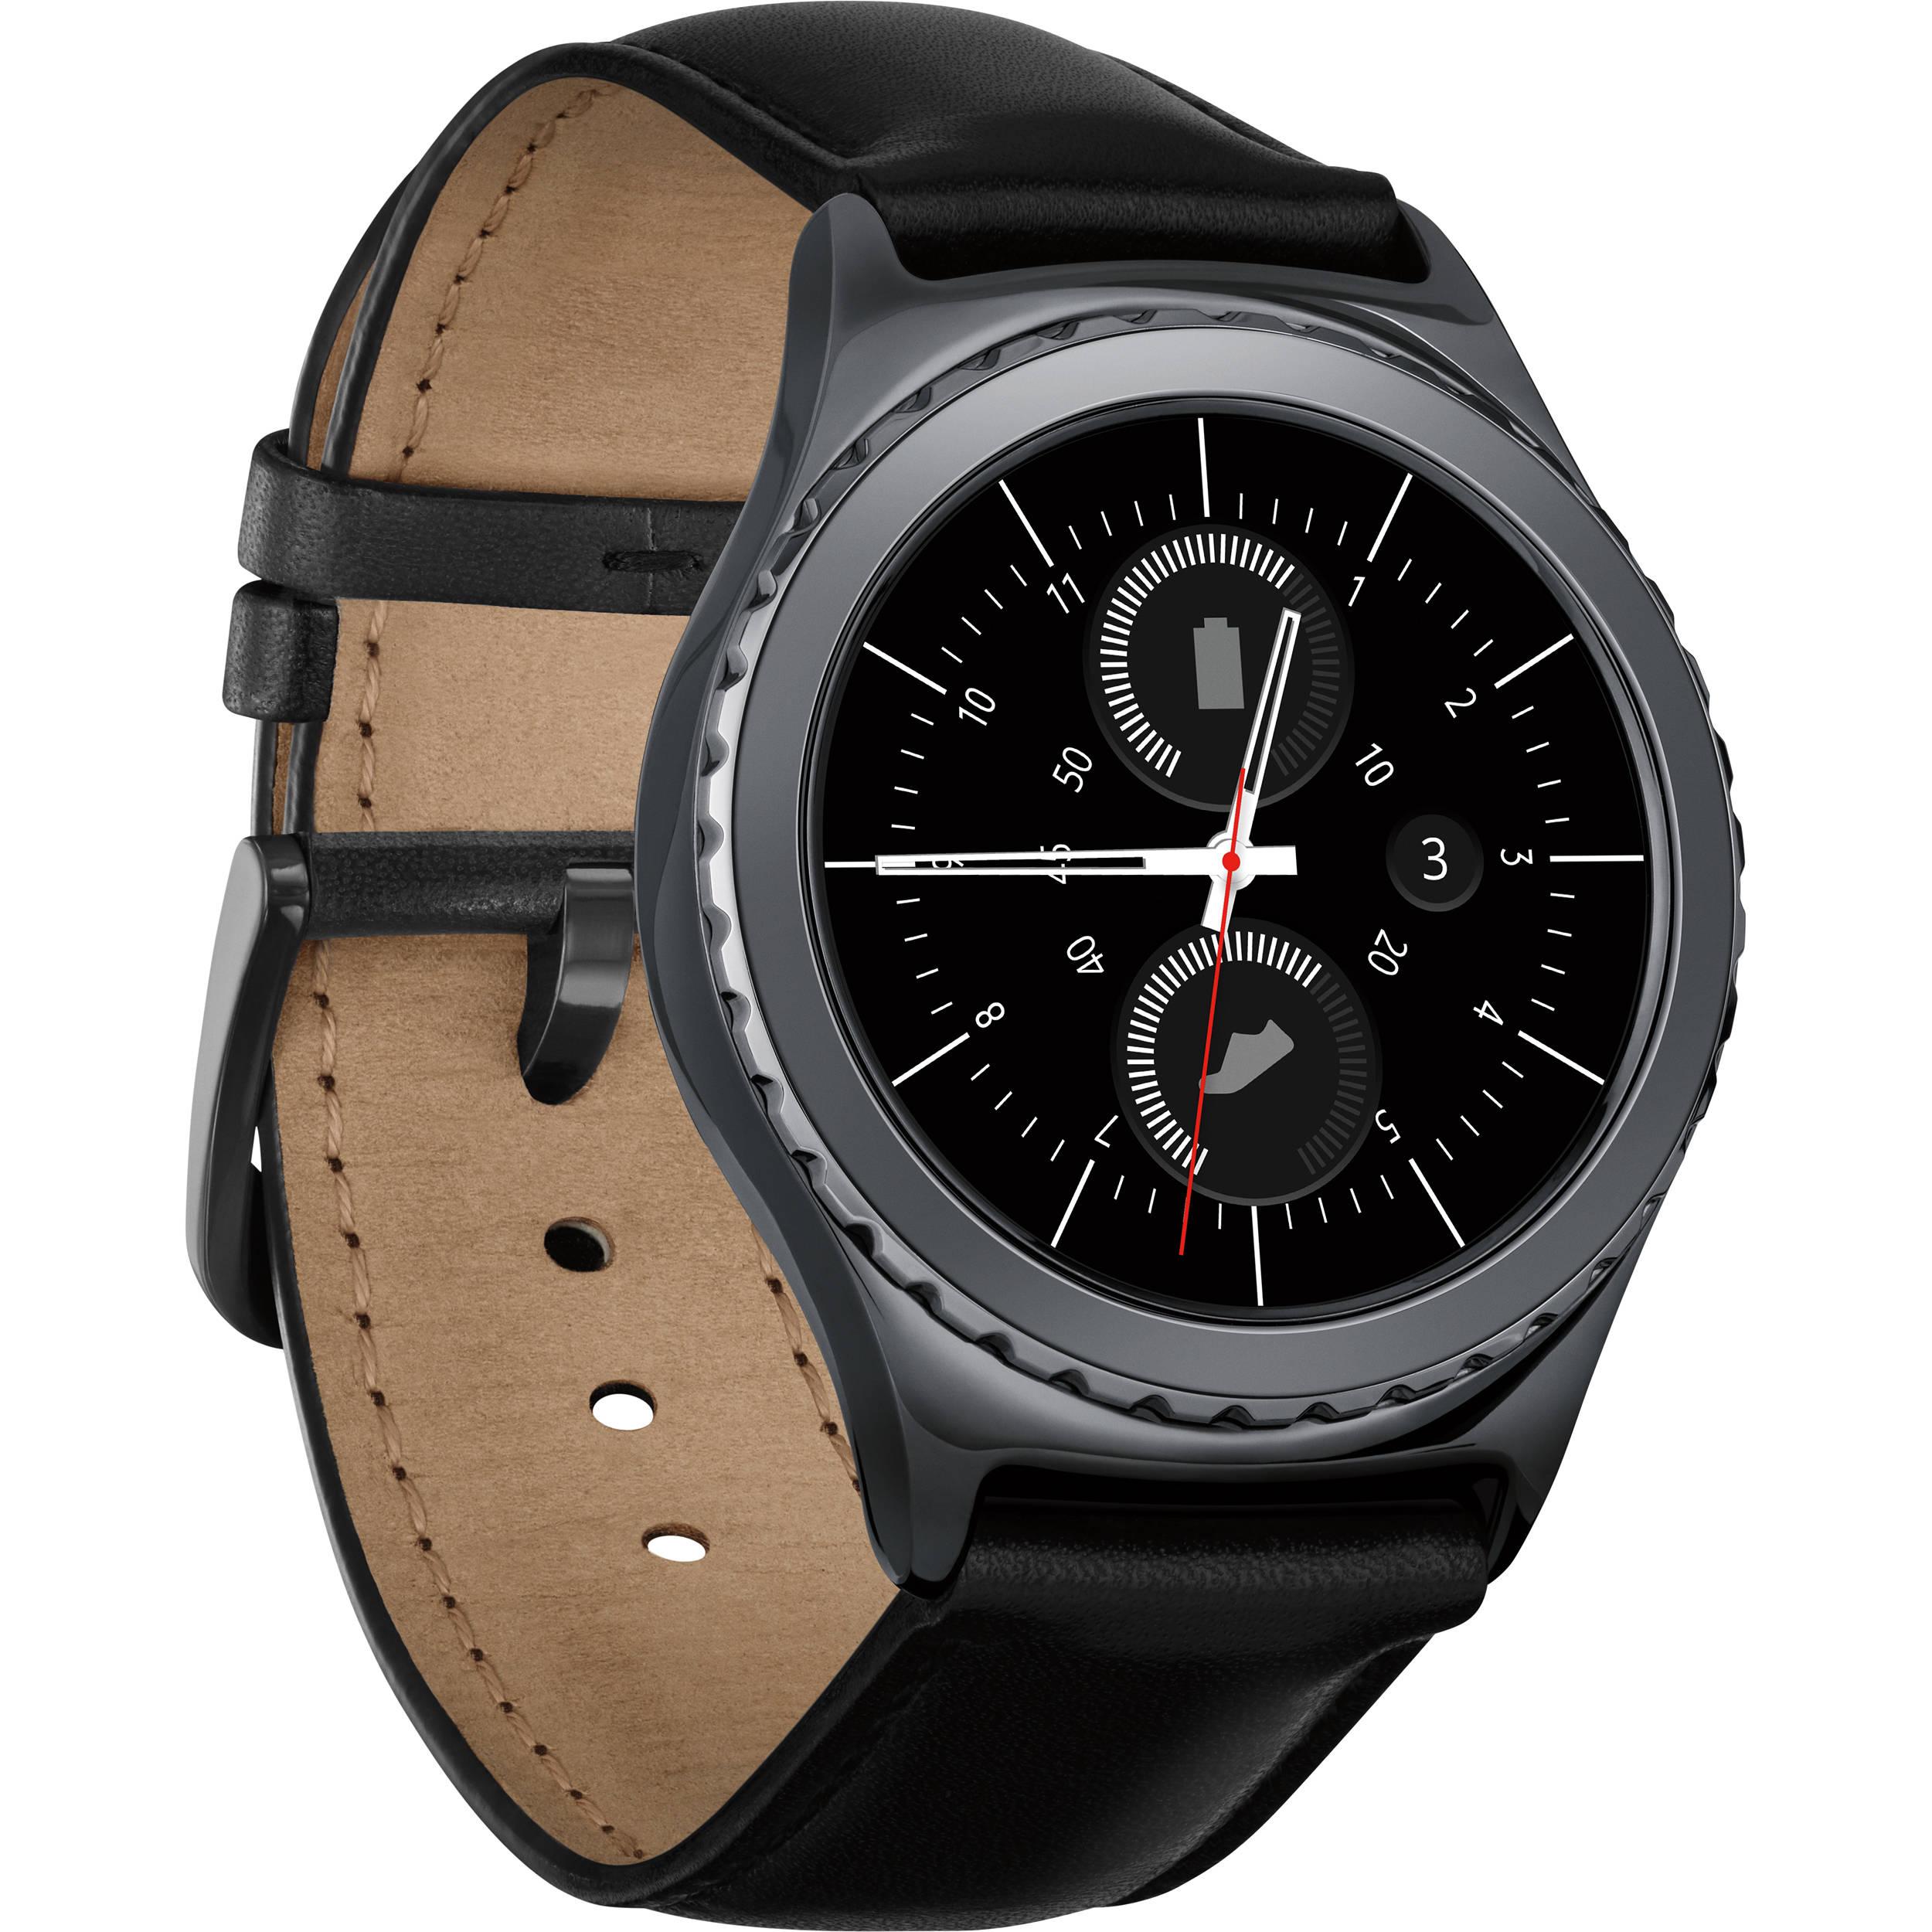 Samsung Gear S2 classic prix tunisie